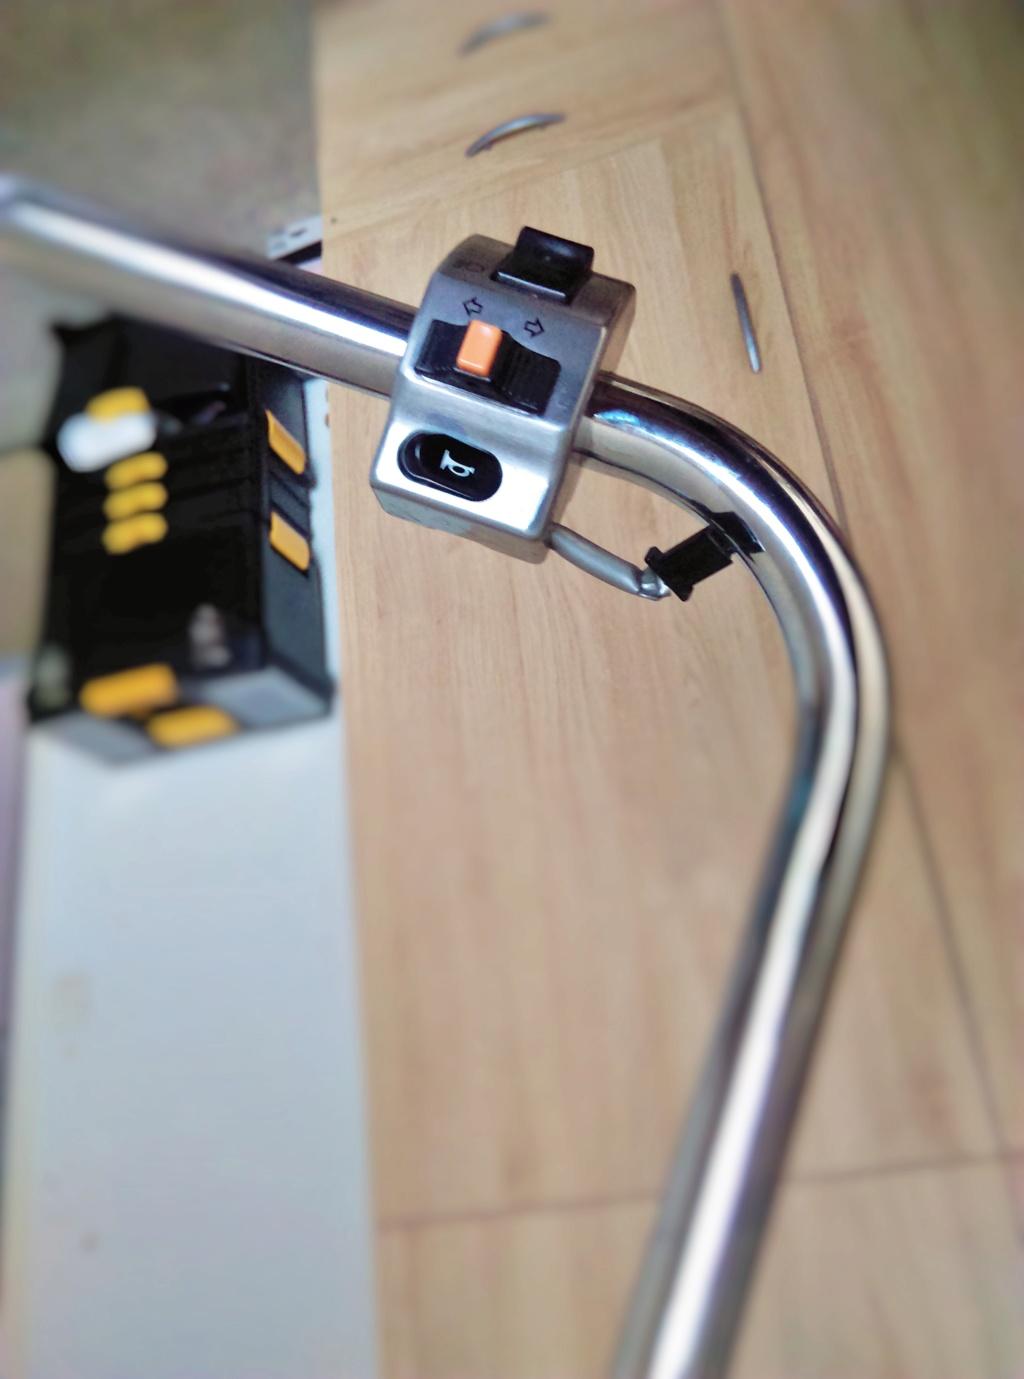 800 VN - Hard Knock Imag1621